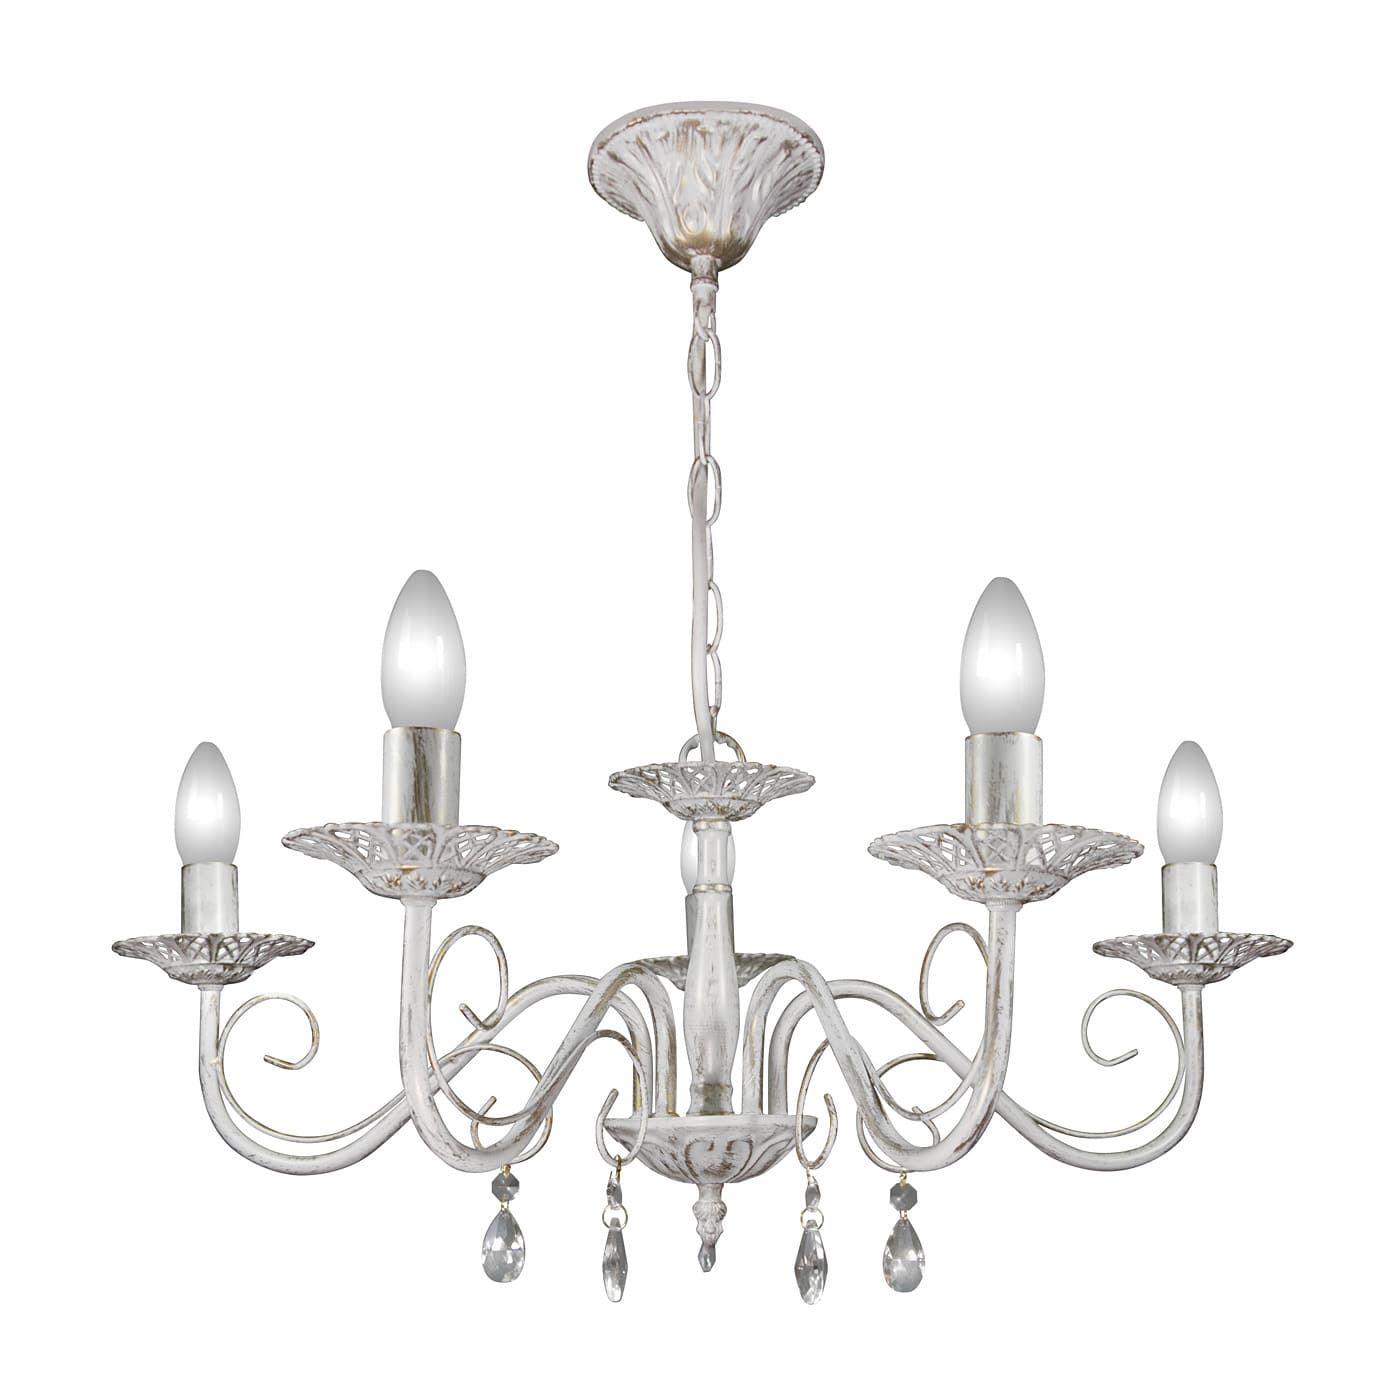 PETRASVET / Pendant chandelier S1019-5, 5xE14 max. 60W